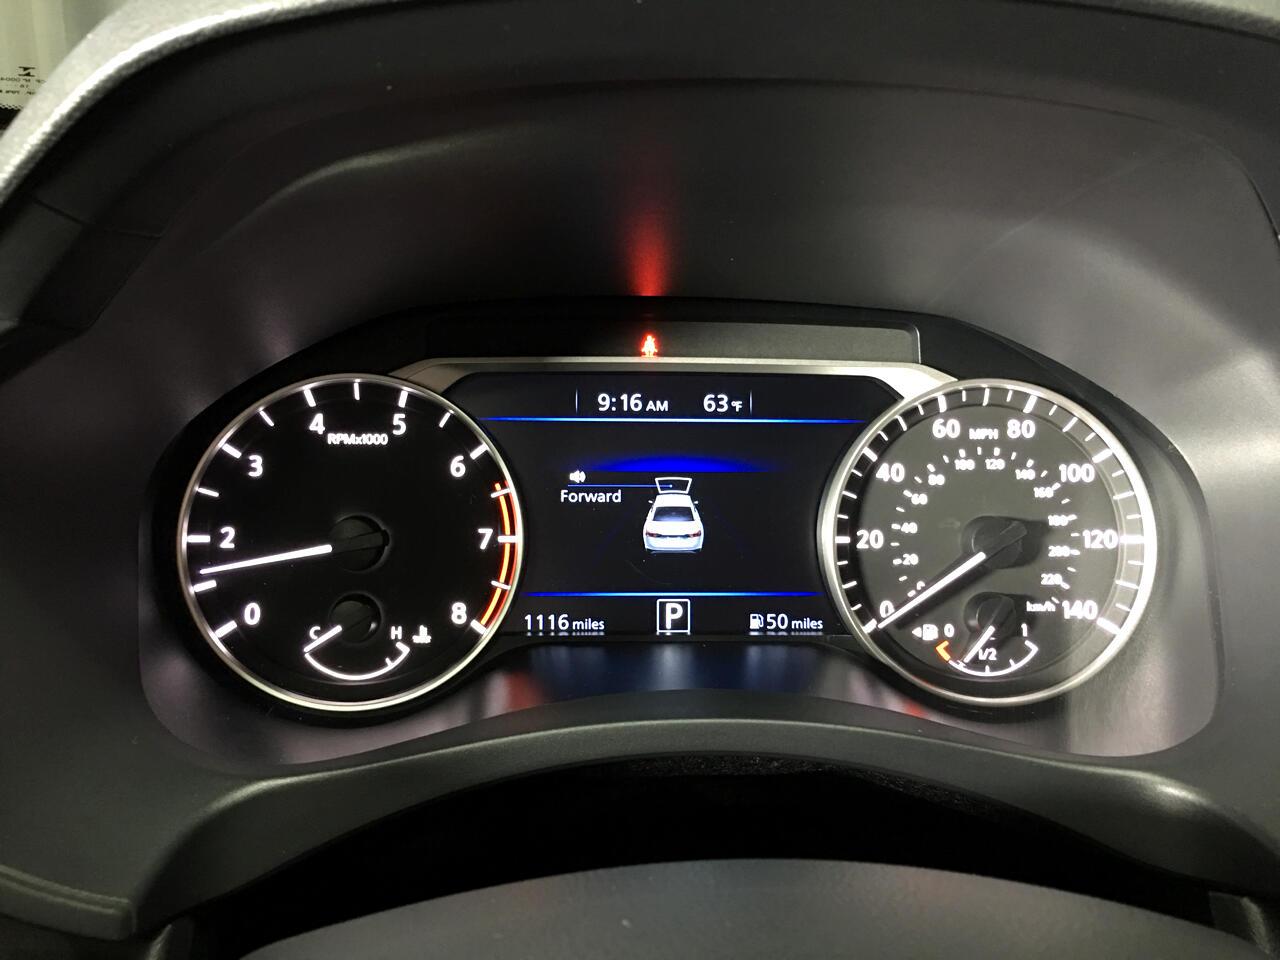 Pre-Owned 2019 Nissan Altima 2.5 S Sedan